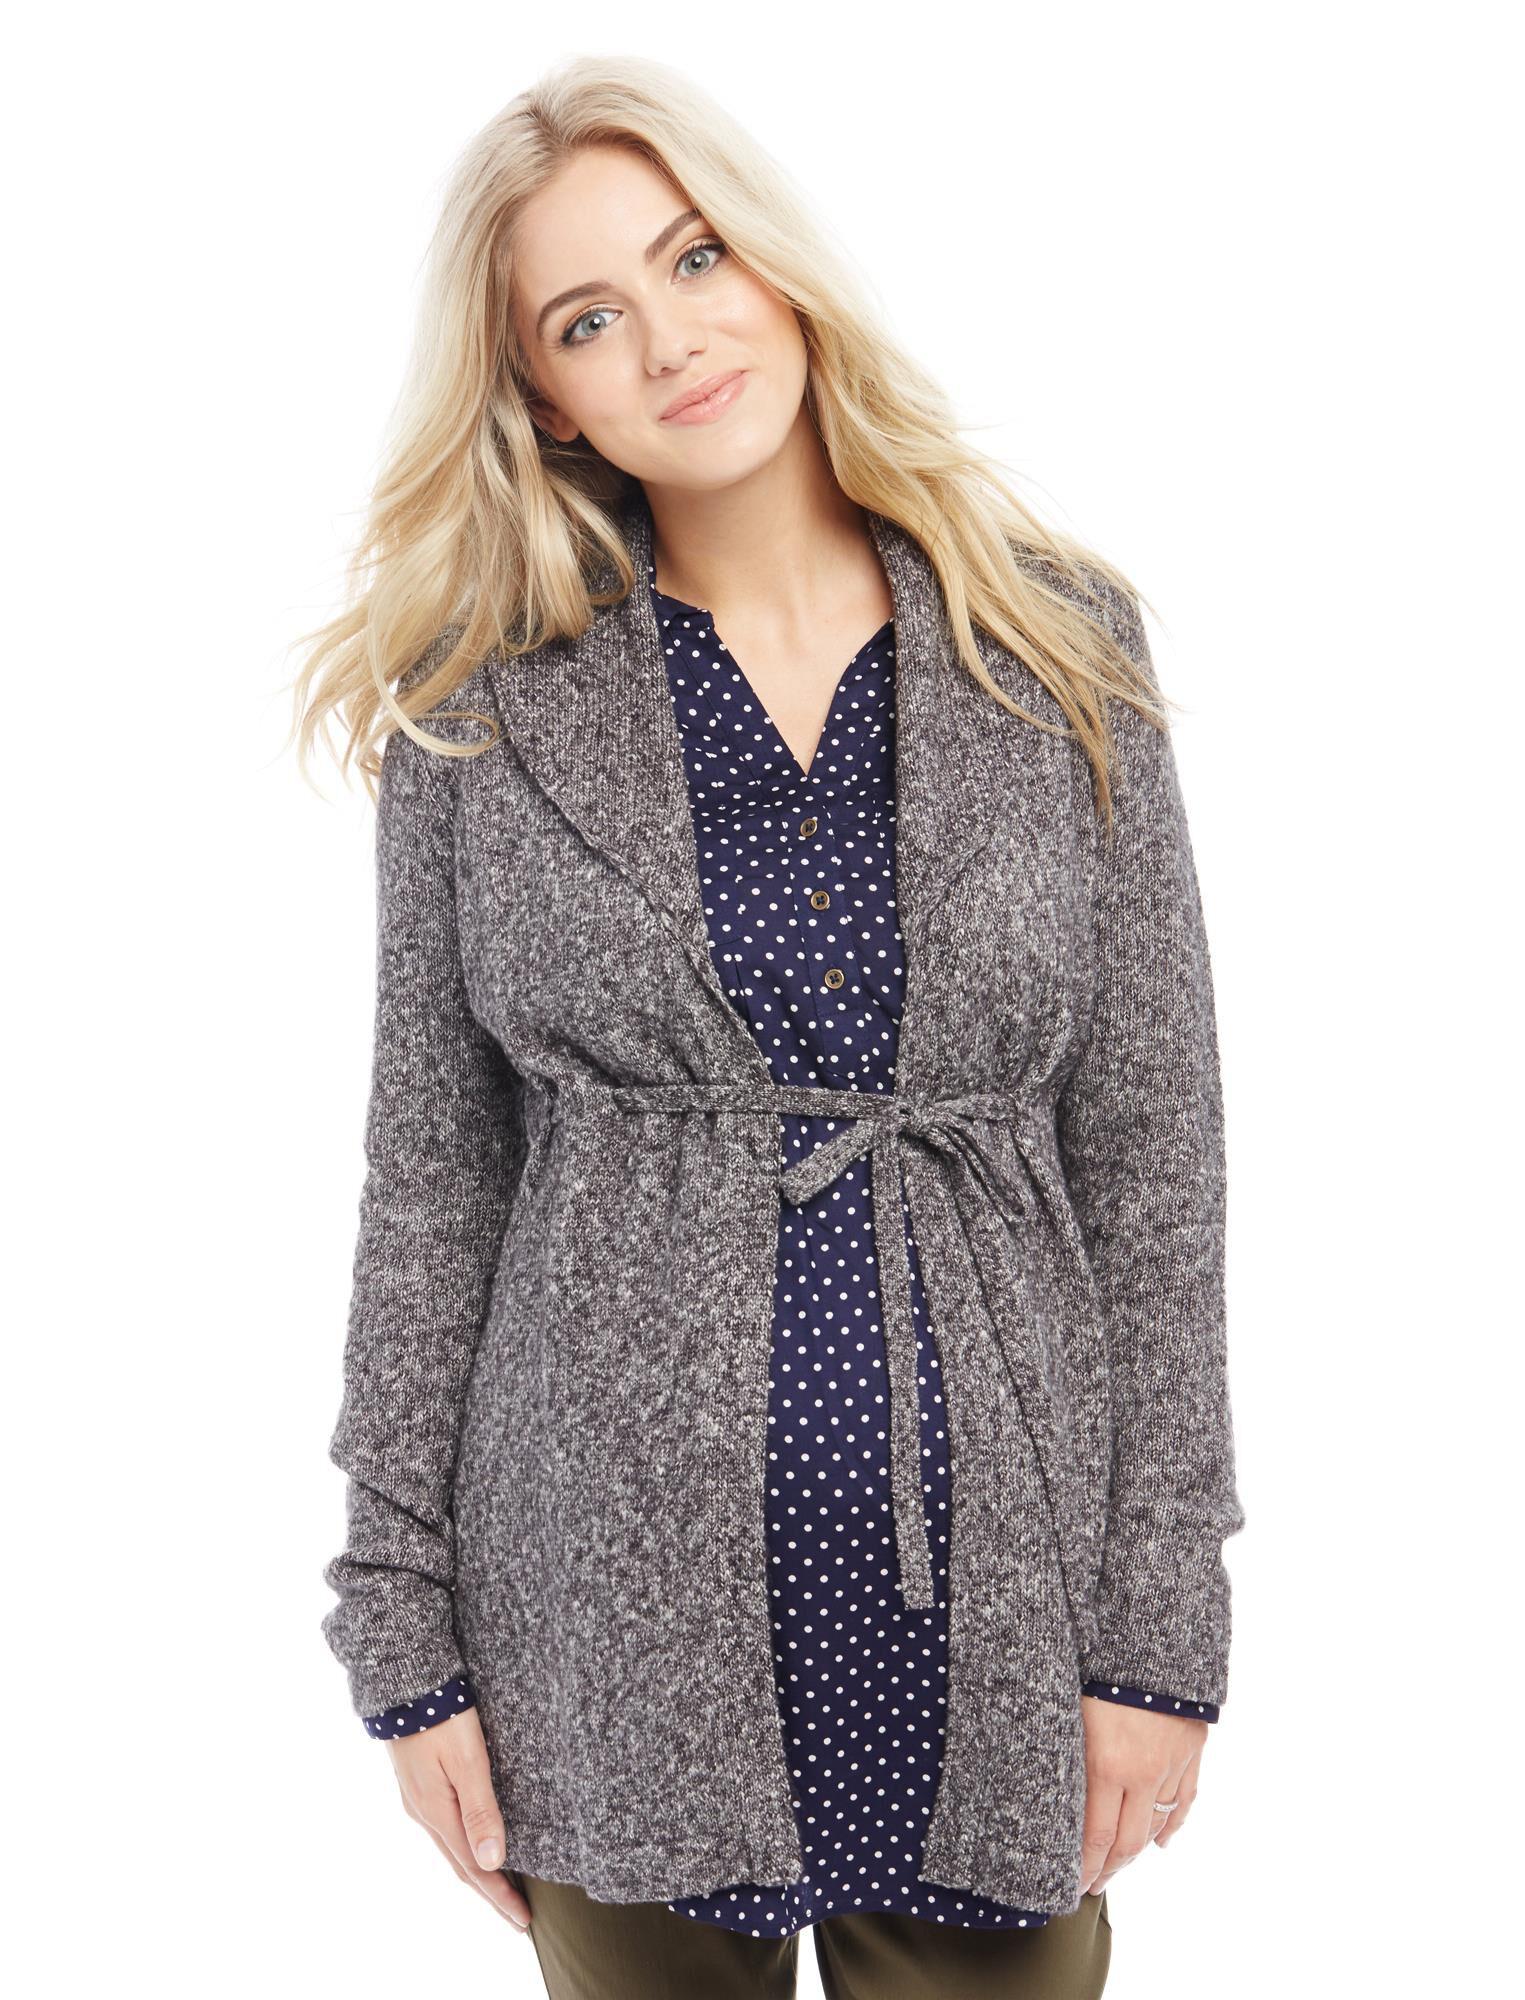 Drawstring Waist Maternity Cardi Sweater